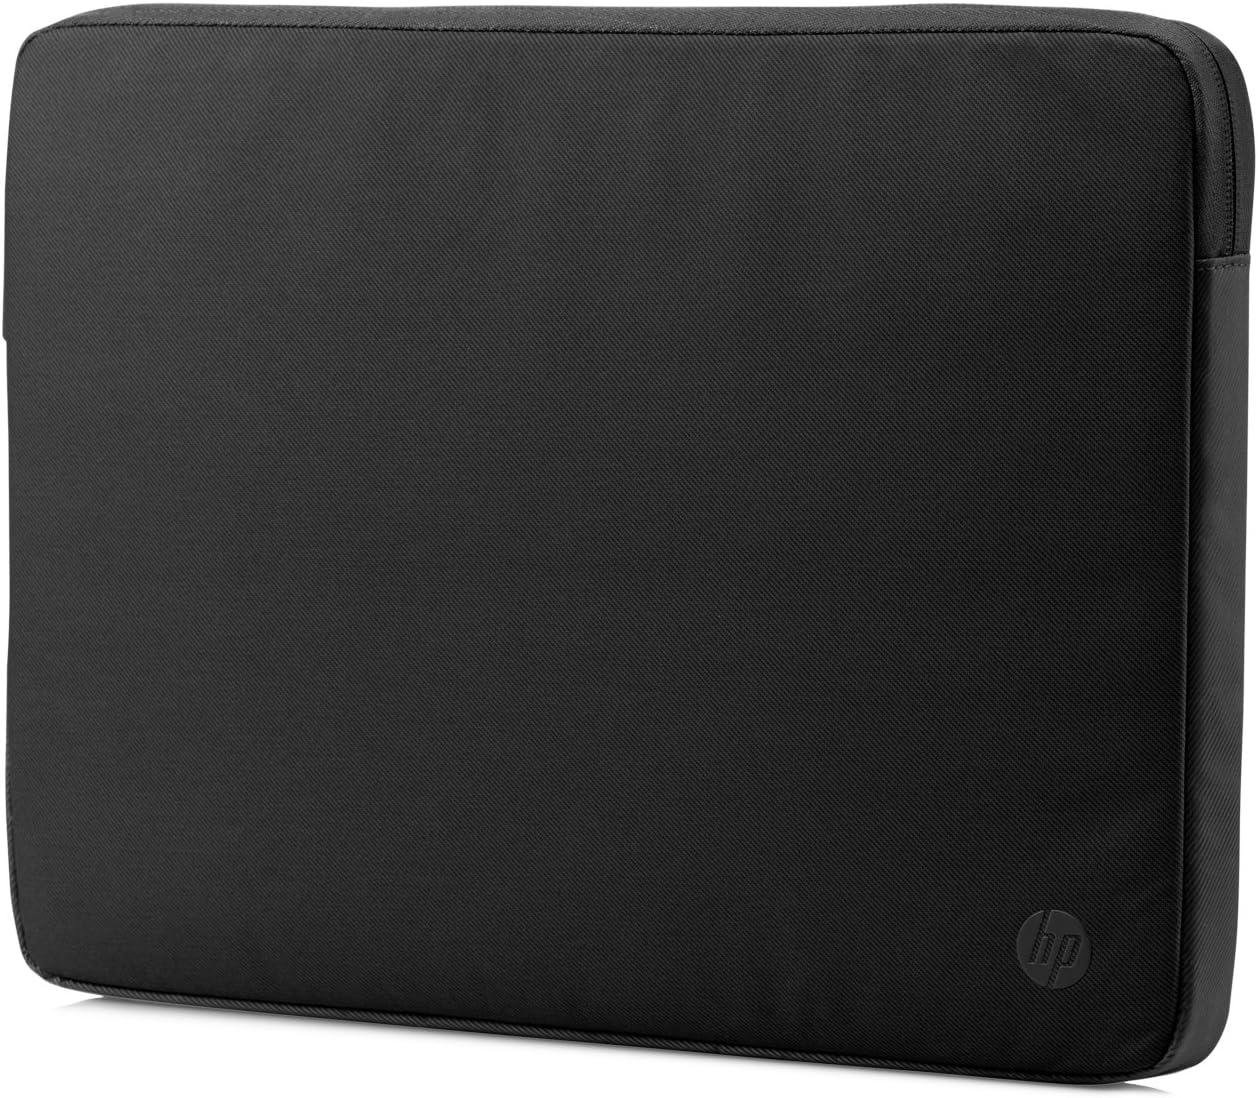 HP Spectrum 14-inch (35-Centimetre) Laptop Sleeve - Black